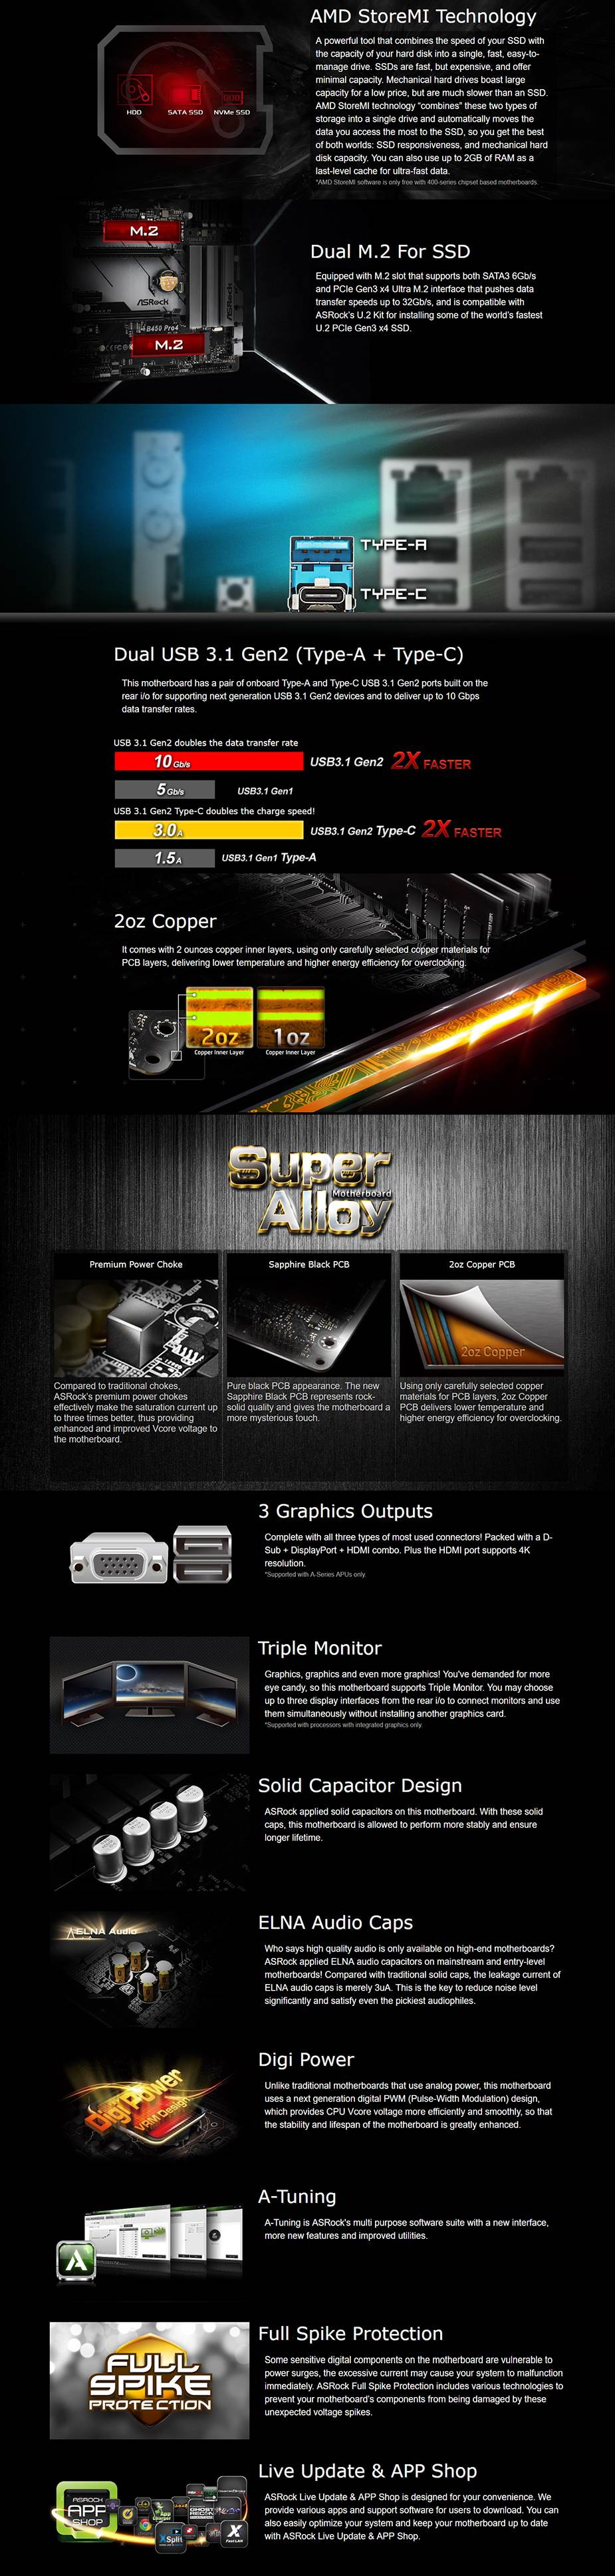 ASRock B450 Pro4 AM4 ATX Motherboard